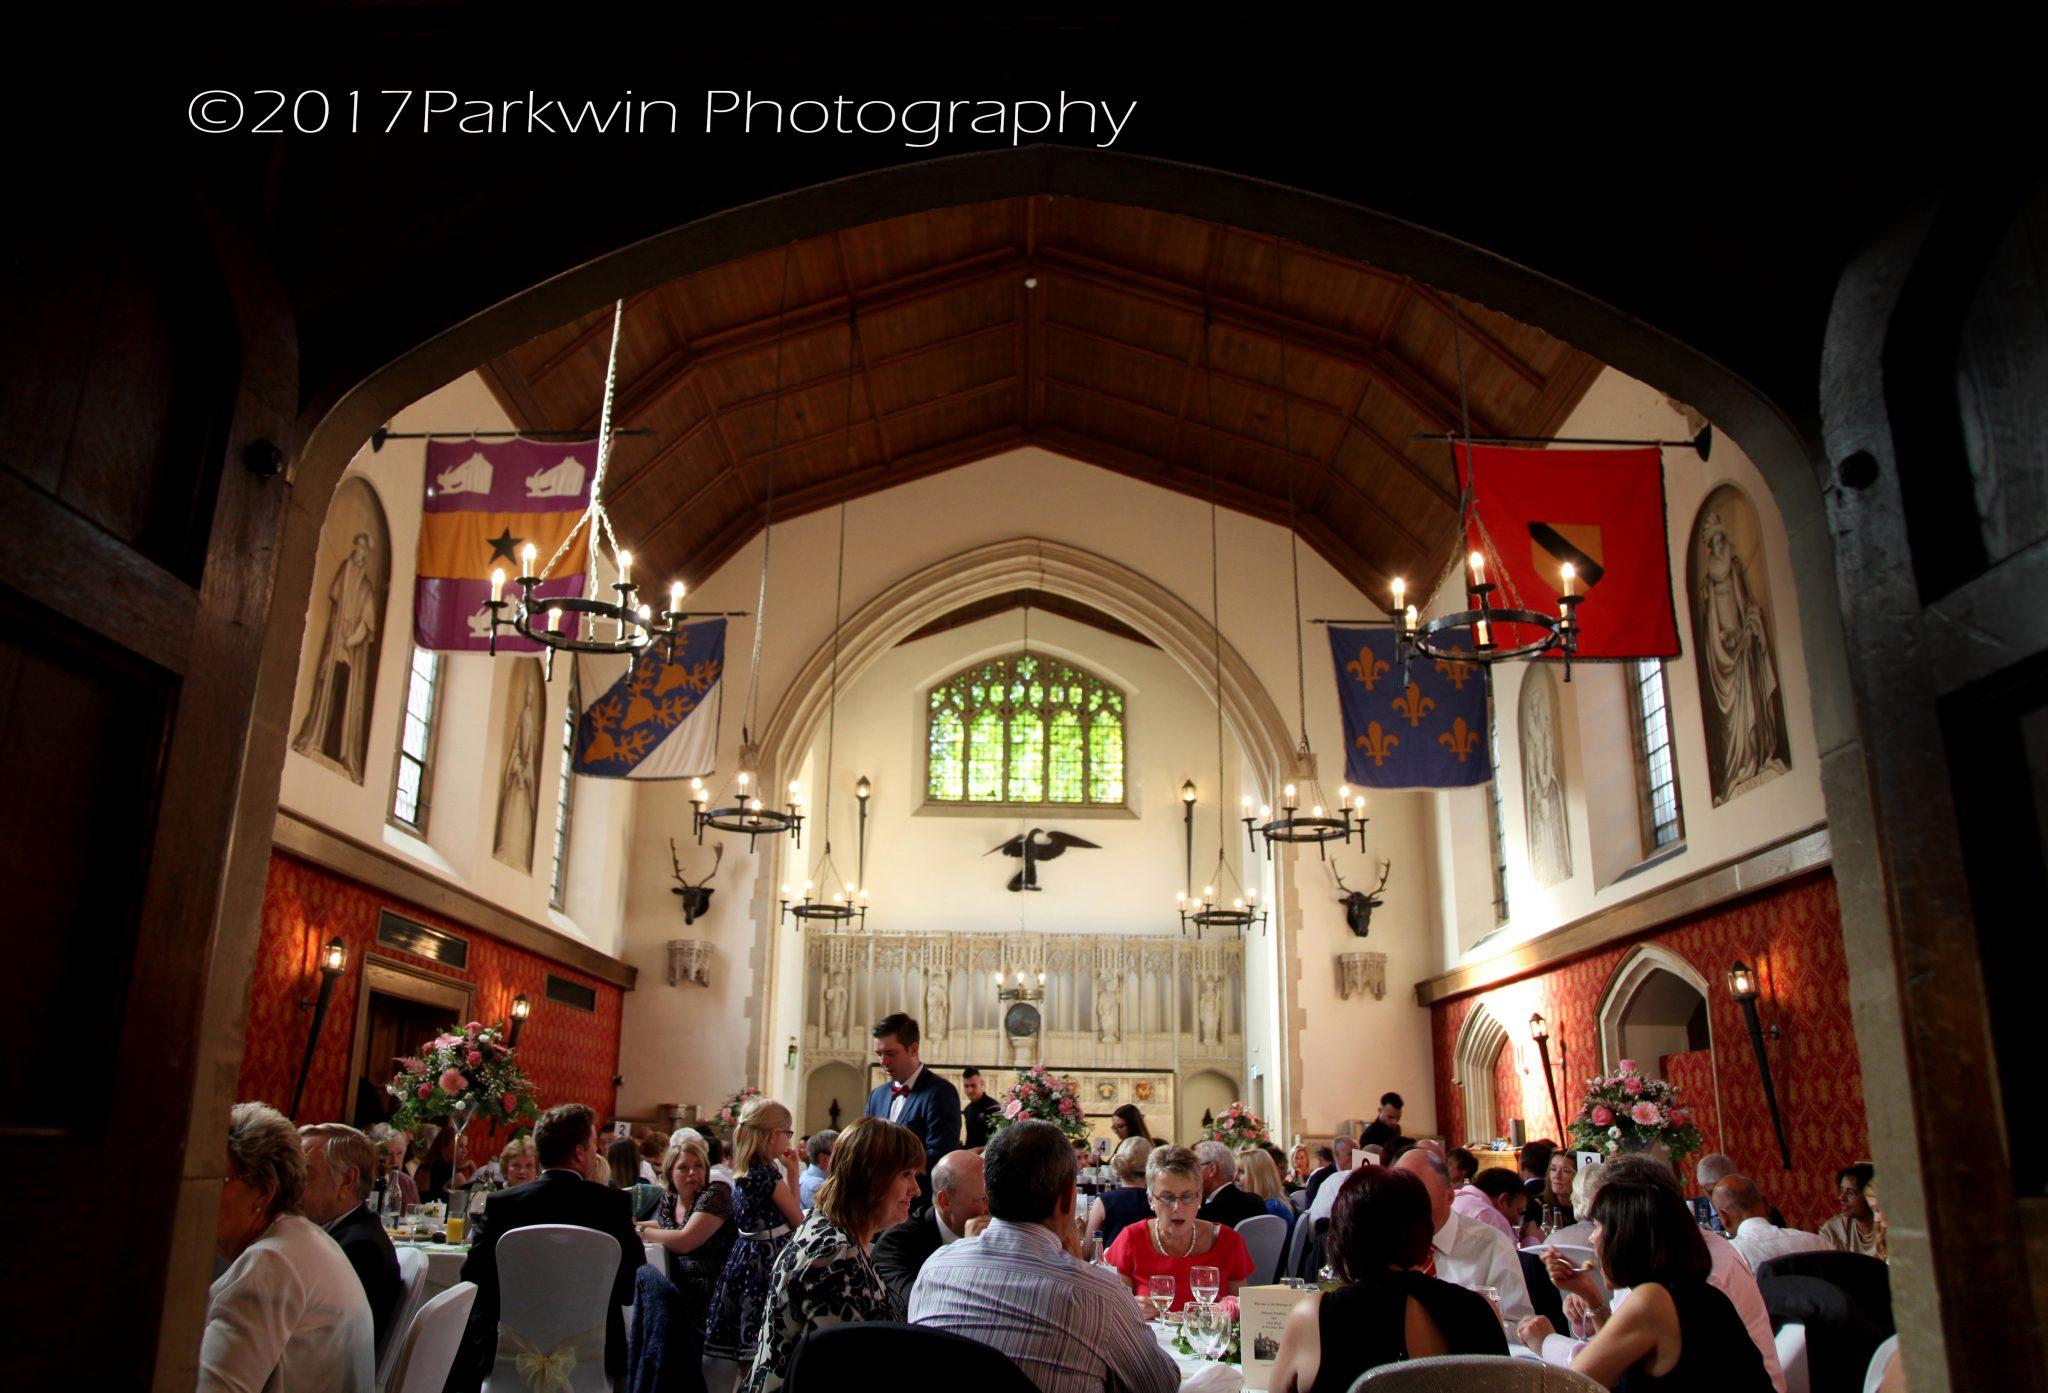 Poles Hall Hanbury Manor